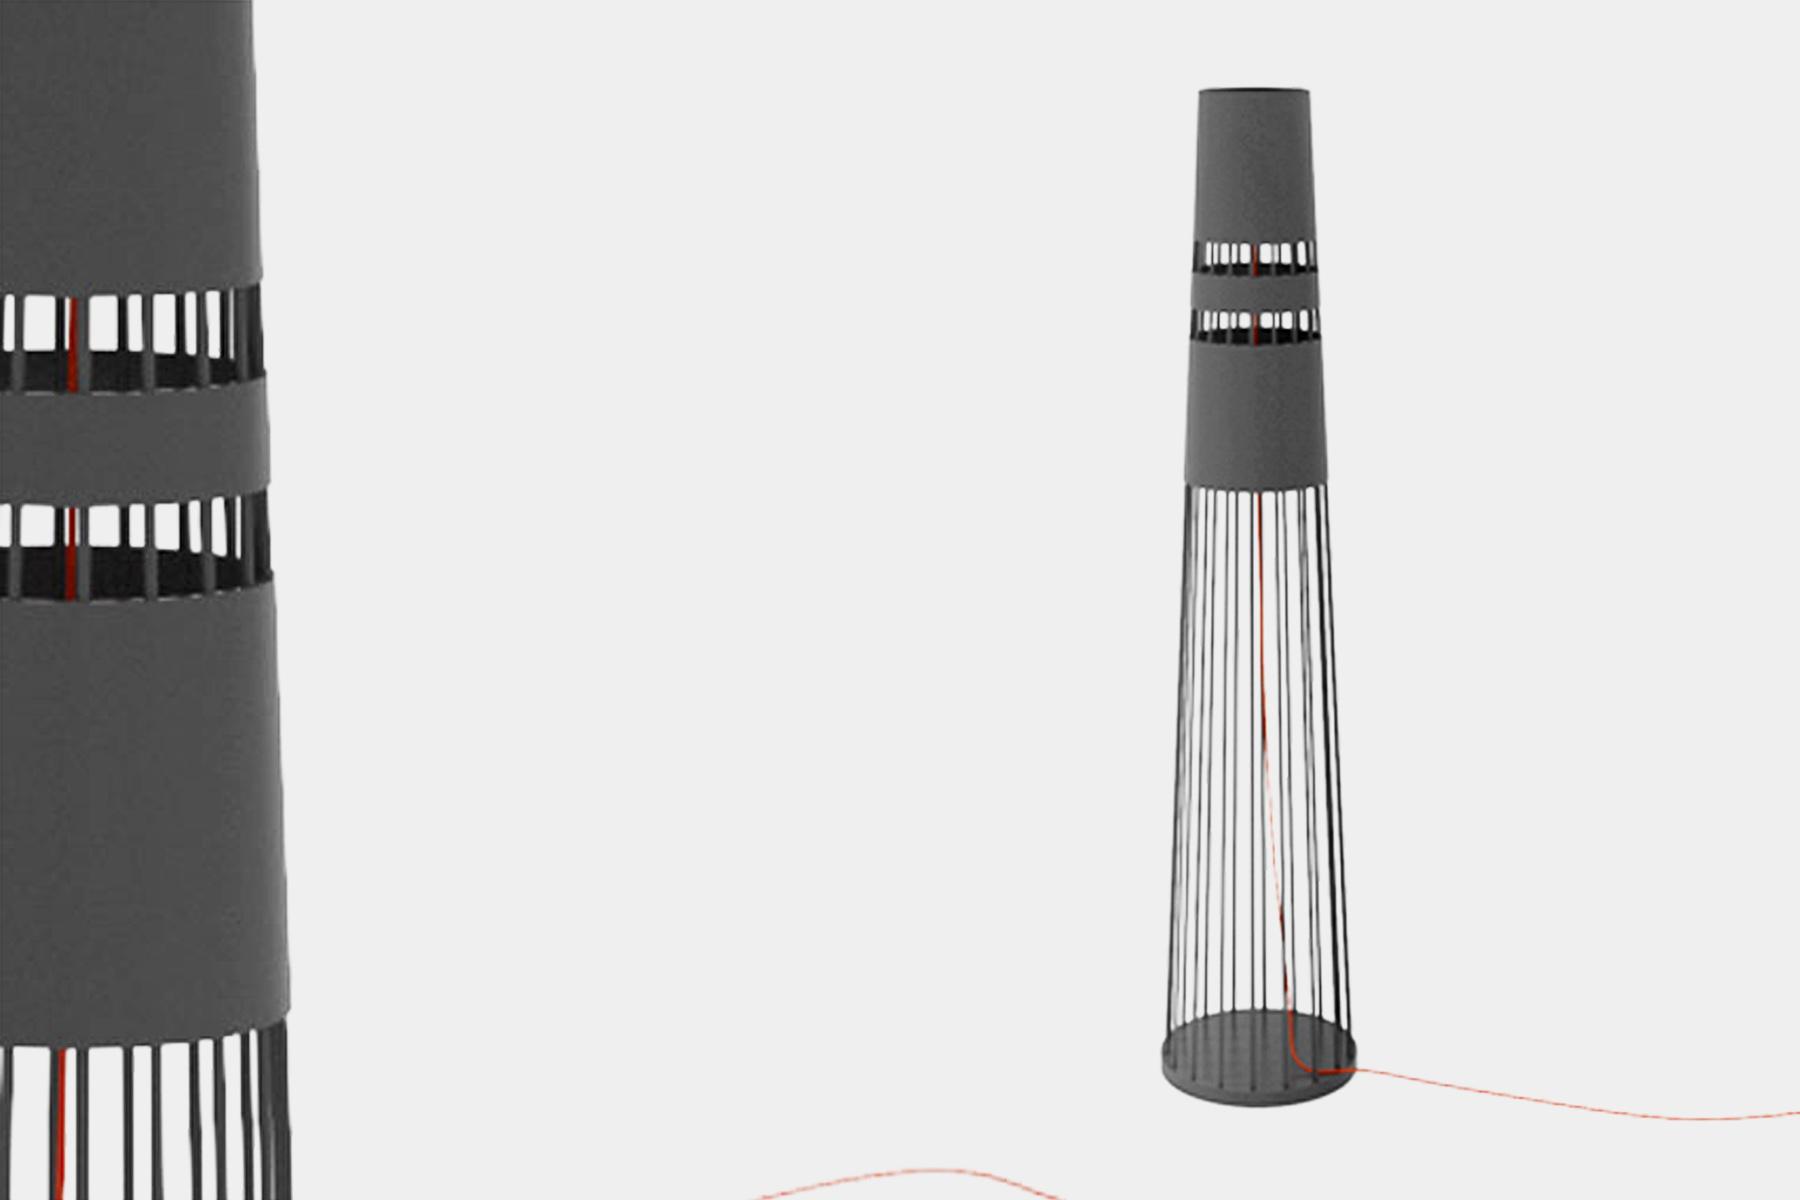 Florence_Watine_Architecte_Designer_Decoratrice_Paris_France_LAMPE_XXL1